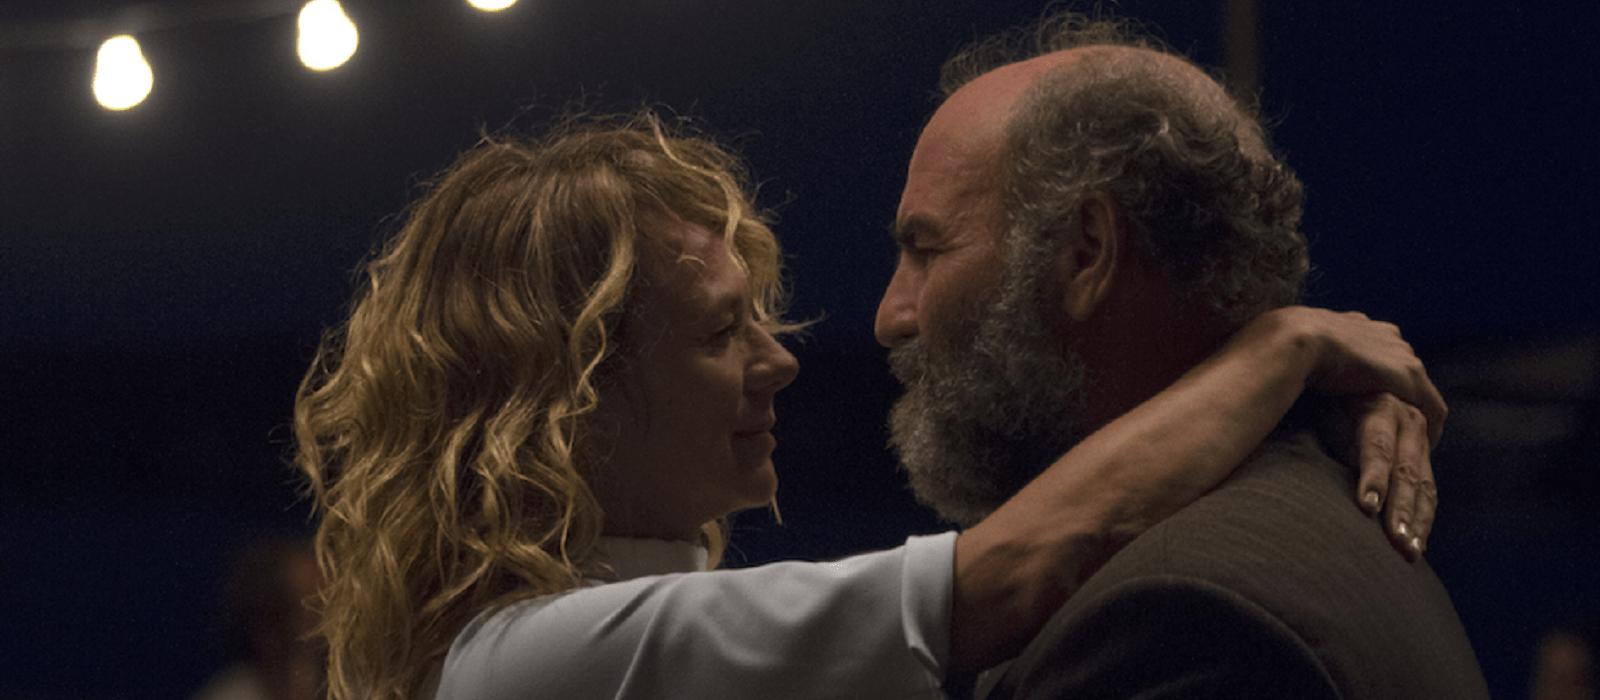 Una ventana al mar, dirigida por Miguel Ángel Jiménez. BCN Film Fest 2020